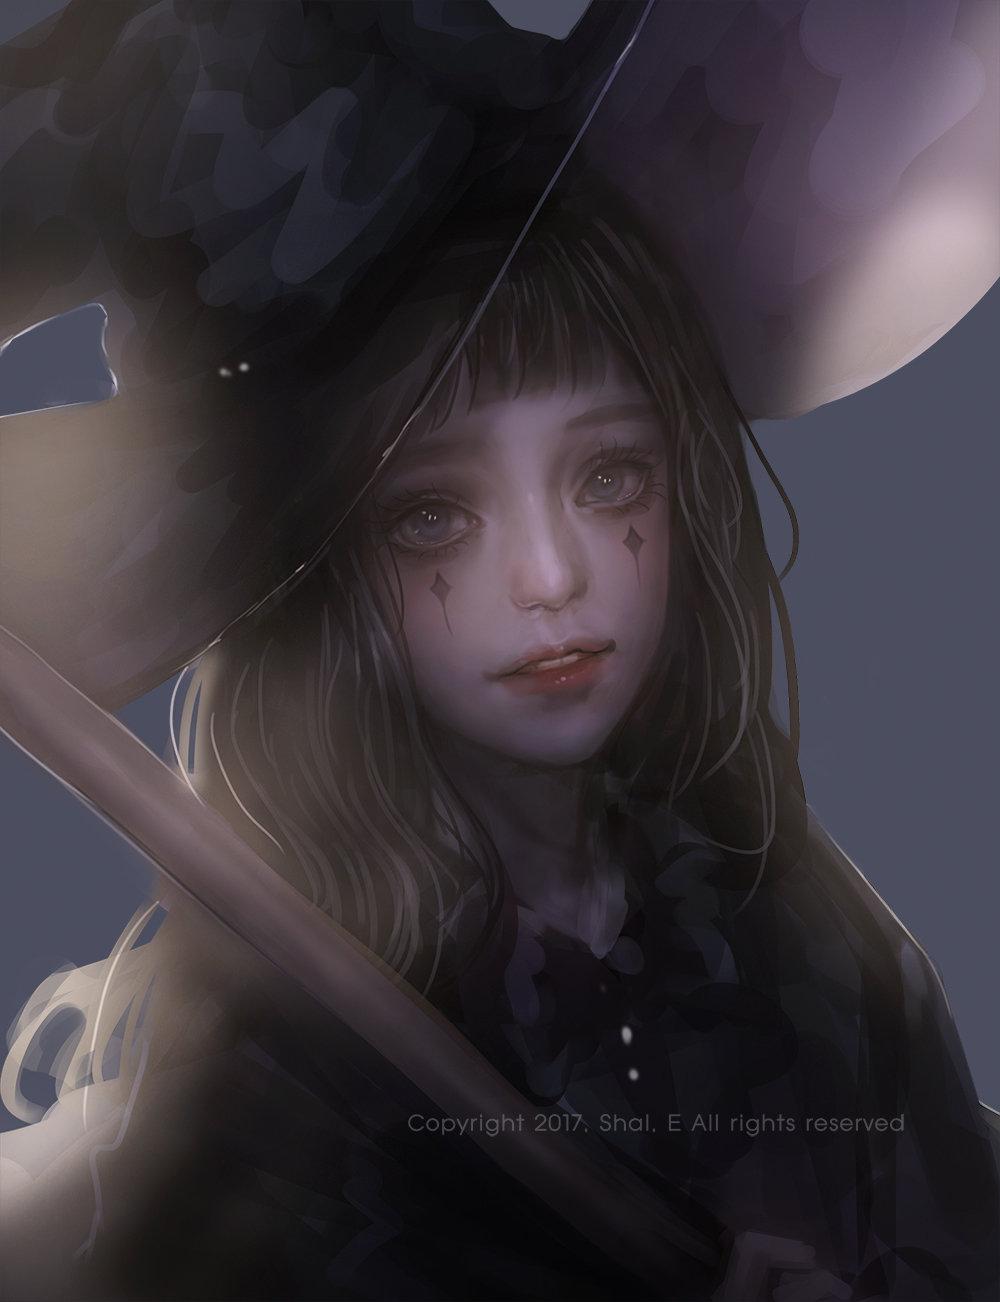 p站韩国插画师Shal.E合集下载